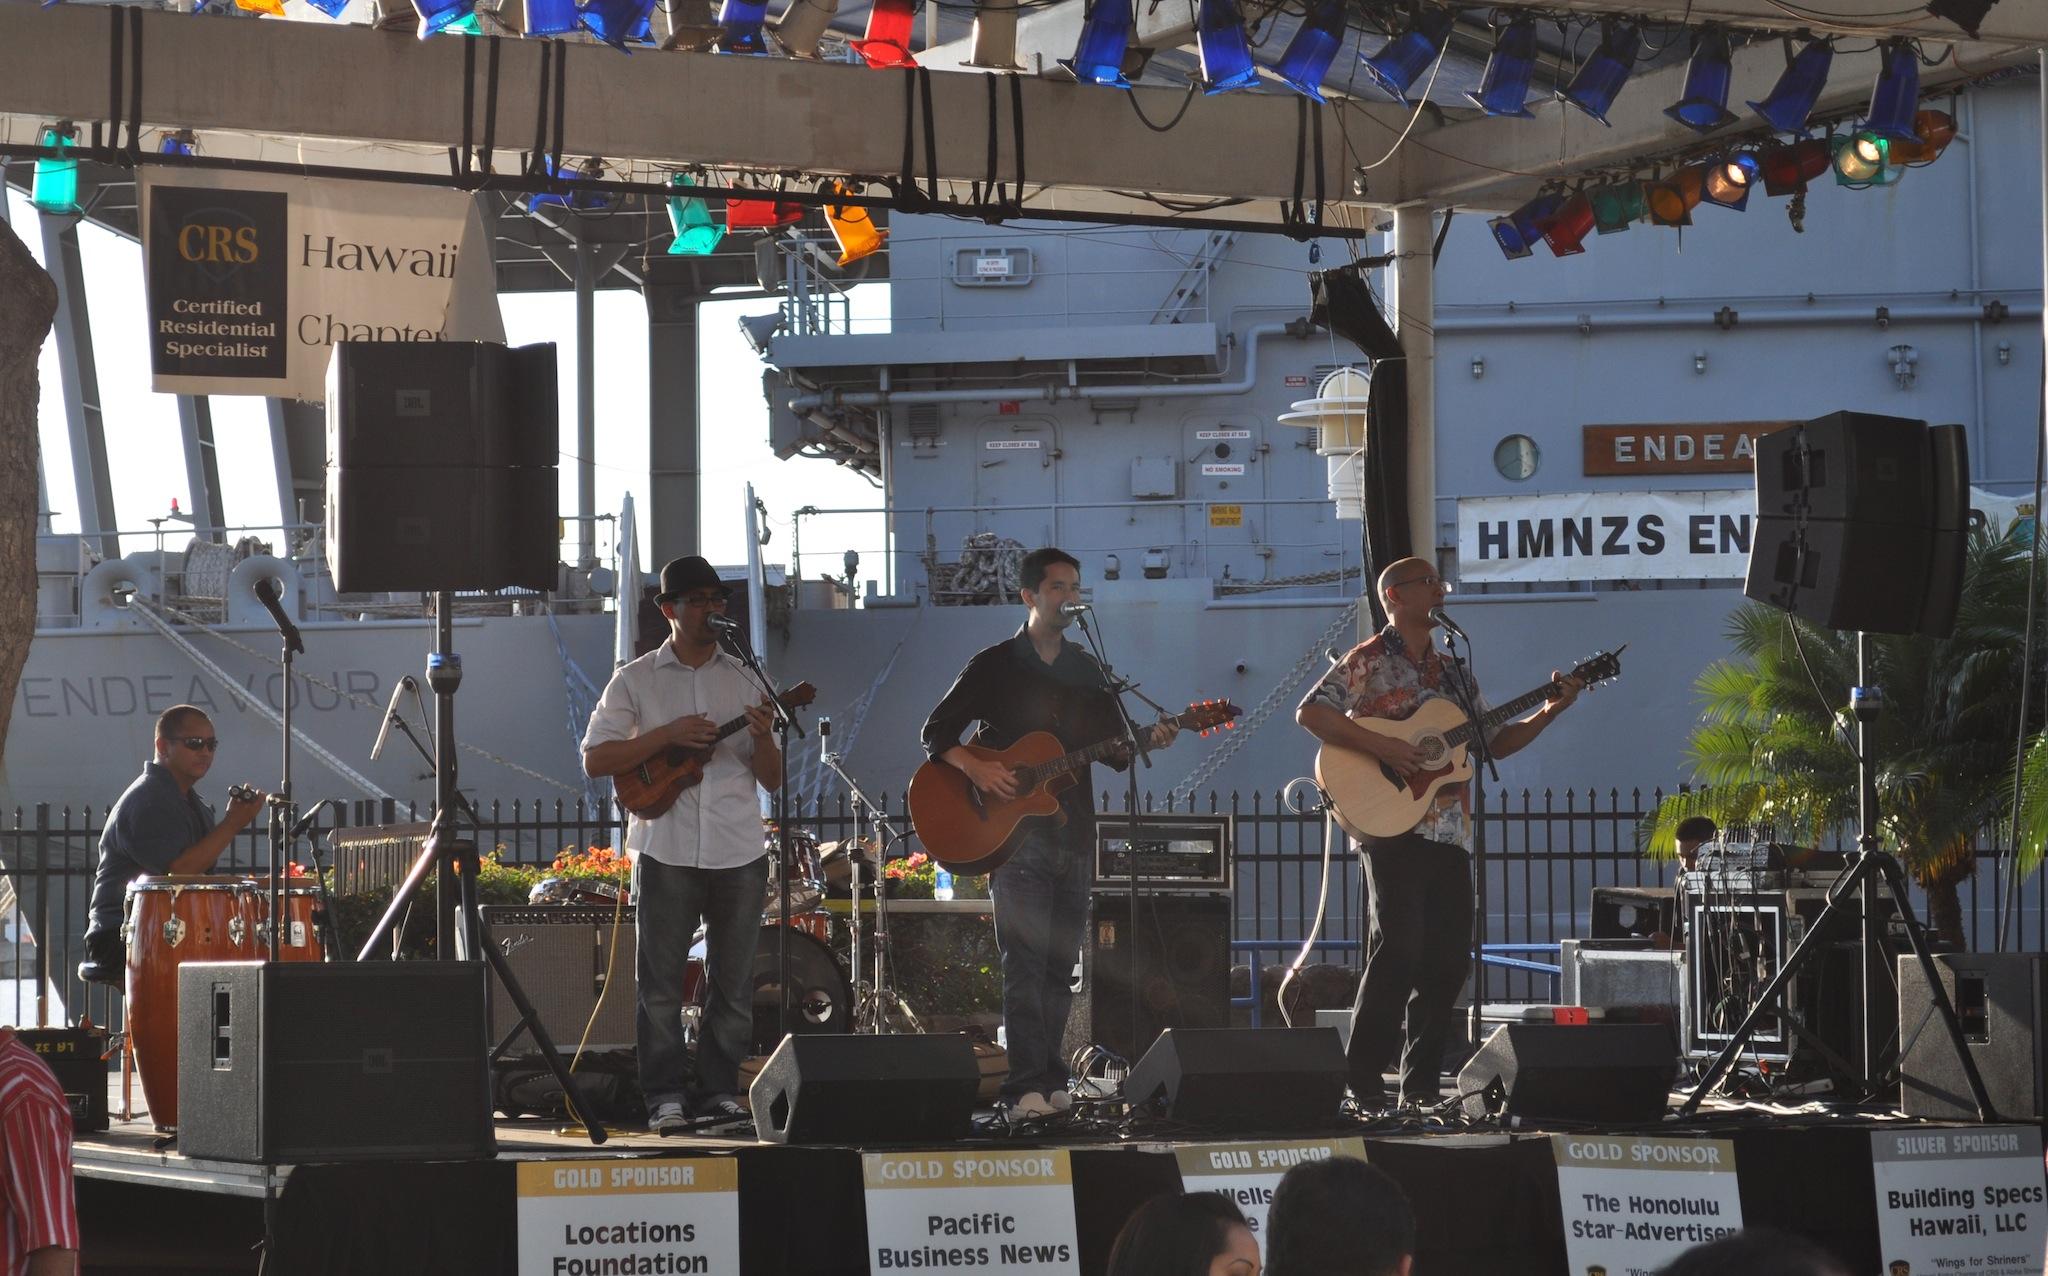 """Wings for Shriners"" Fundraising Event (@hanaialii @manoadna @jonyamasato)- Recorded on August 3, 2012"